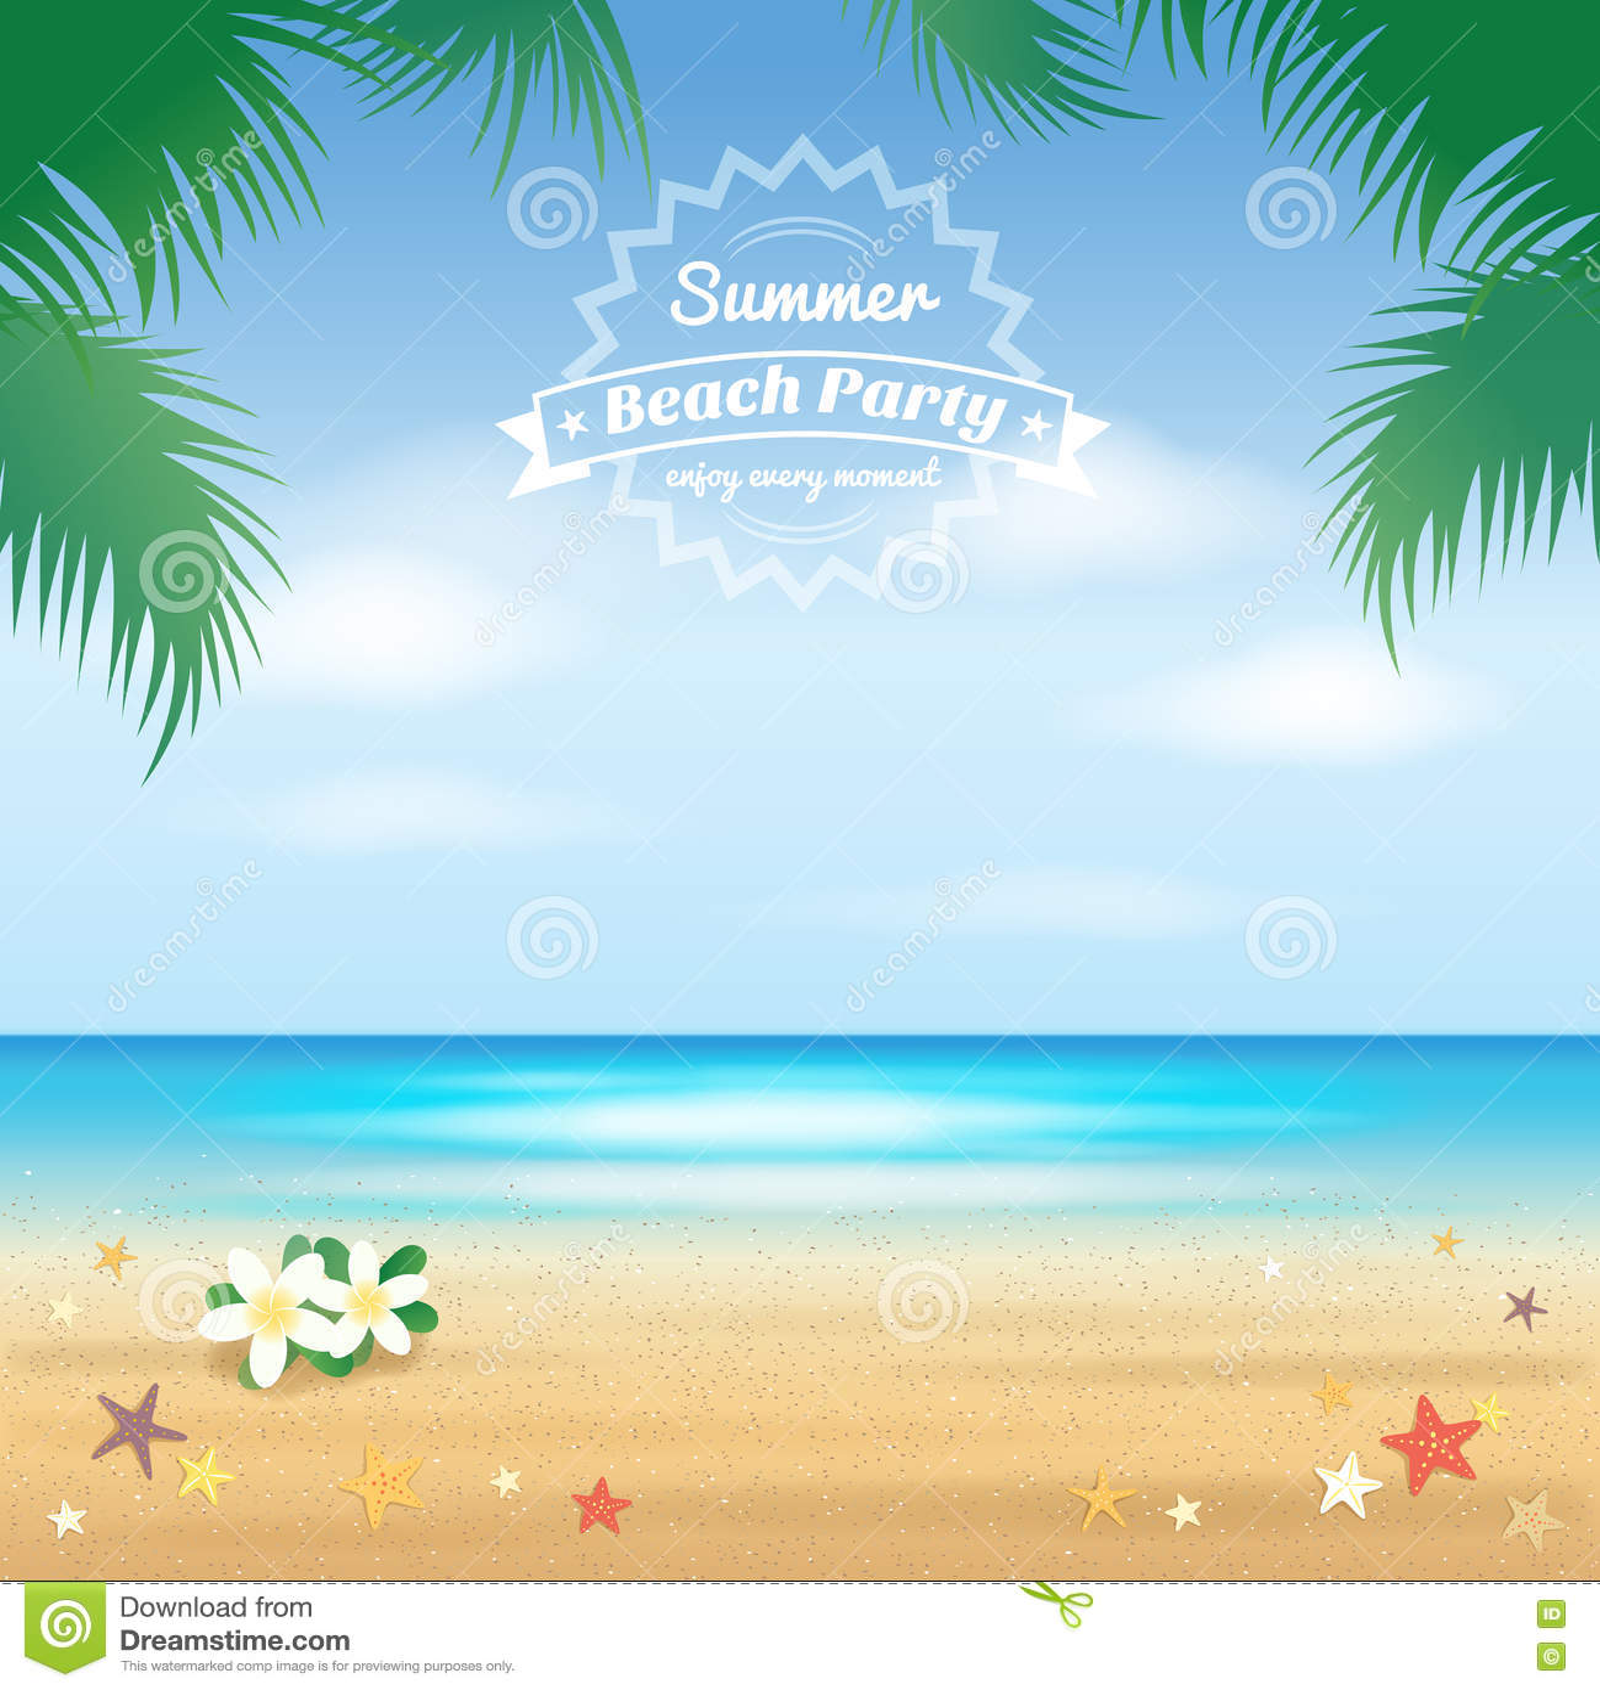 summer beach party hello summer background stock vector